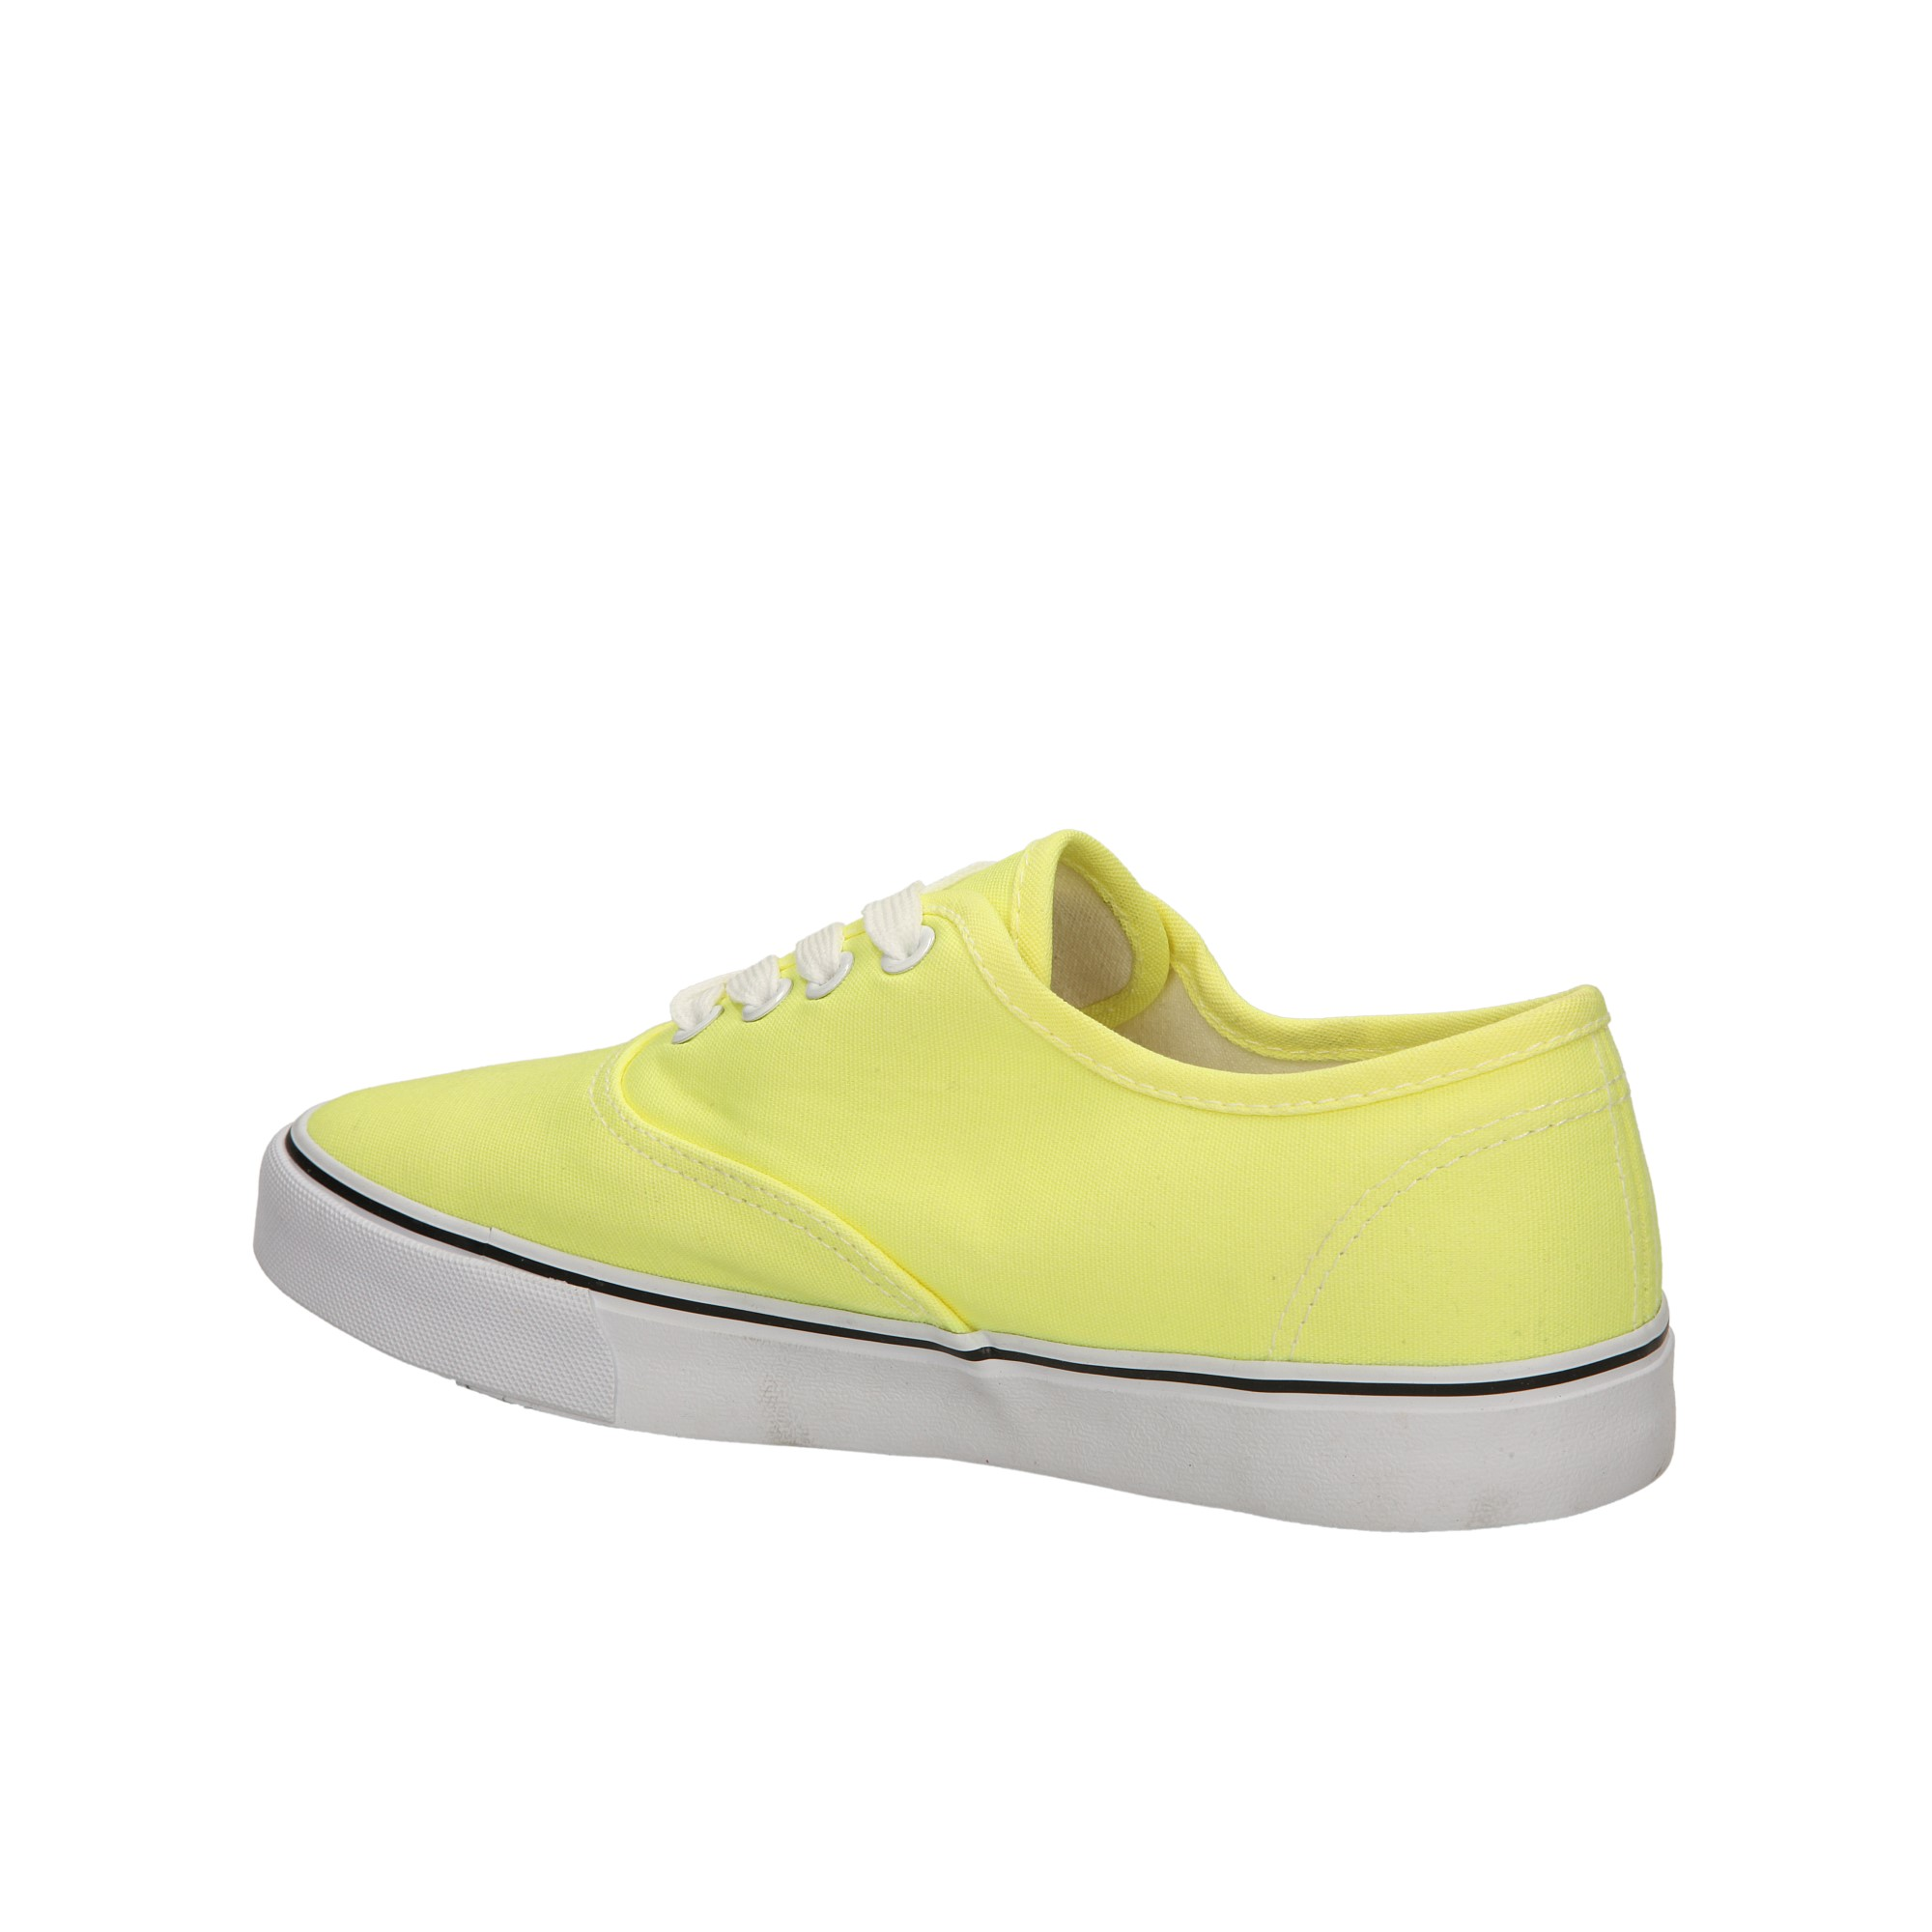 TRAMPKI CASU 7TX-JA141156 kolor fuksja, żółty